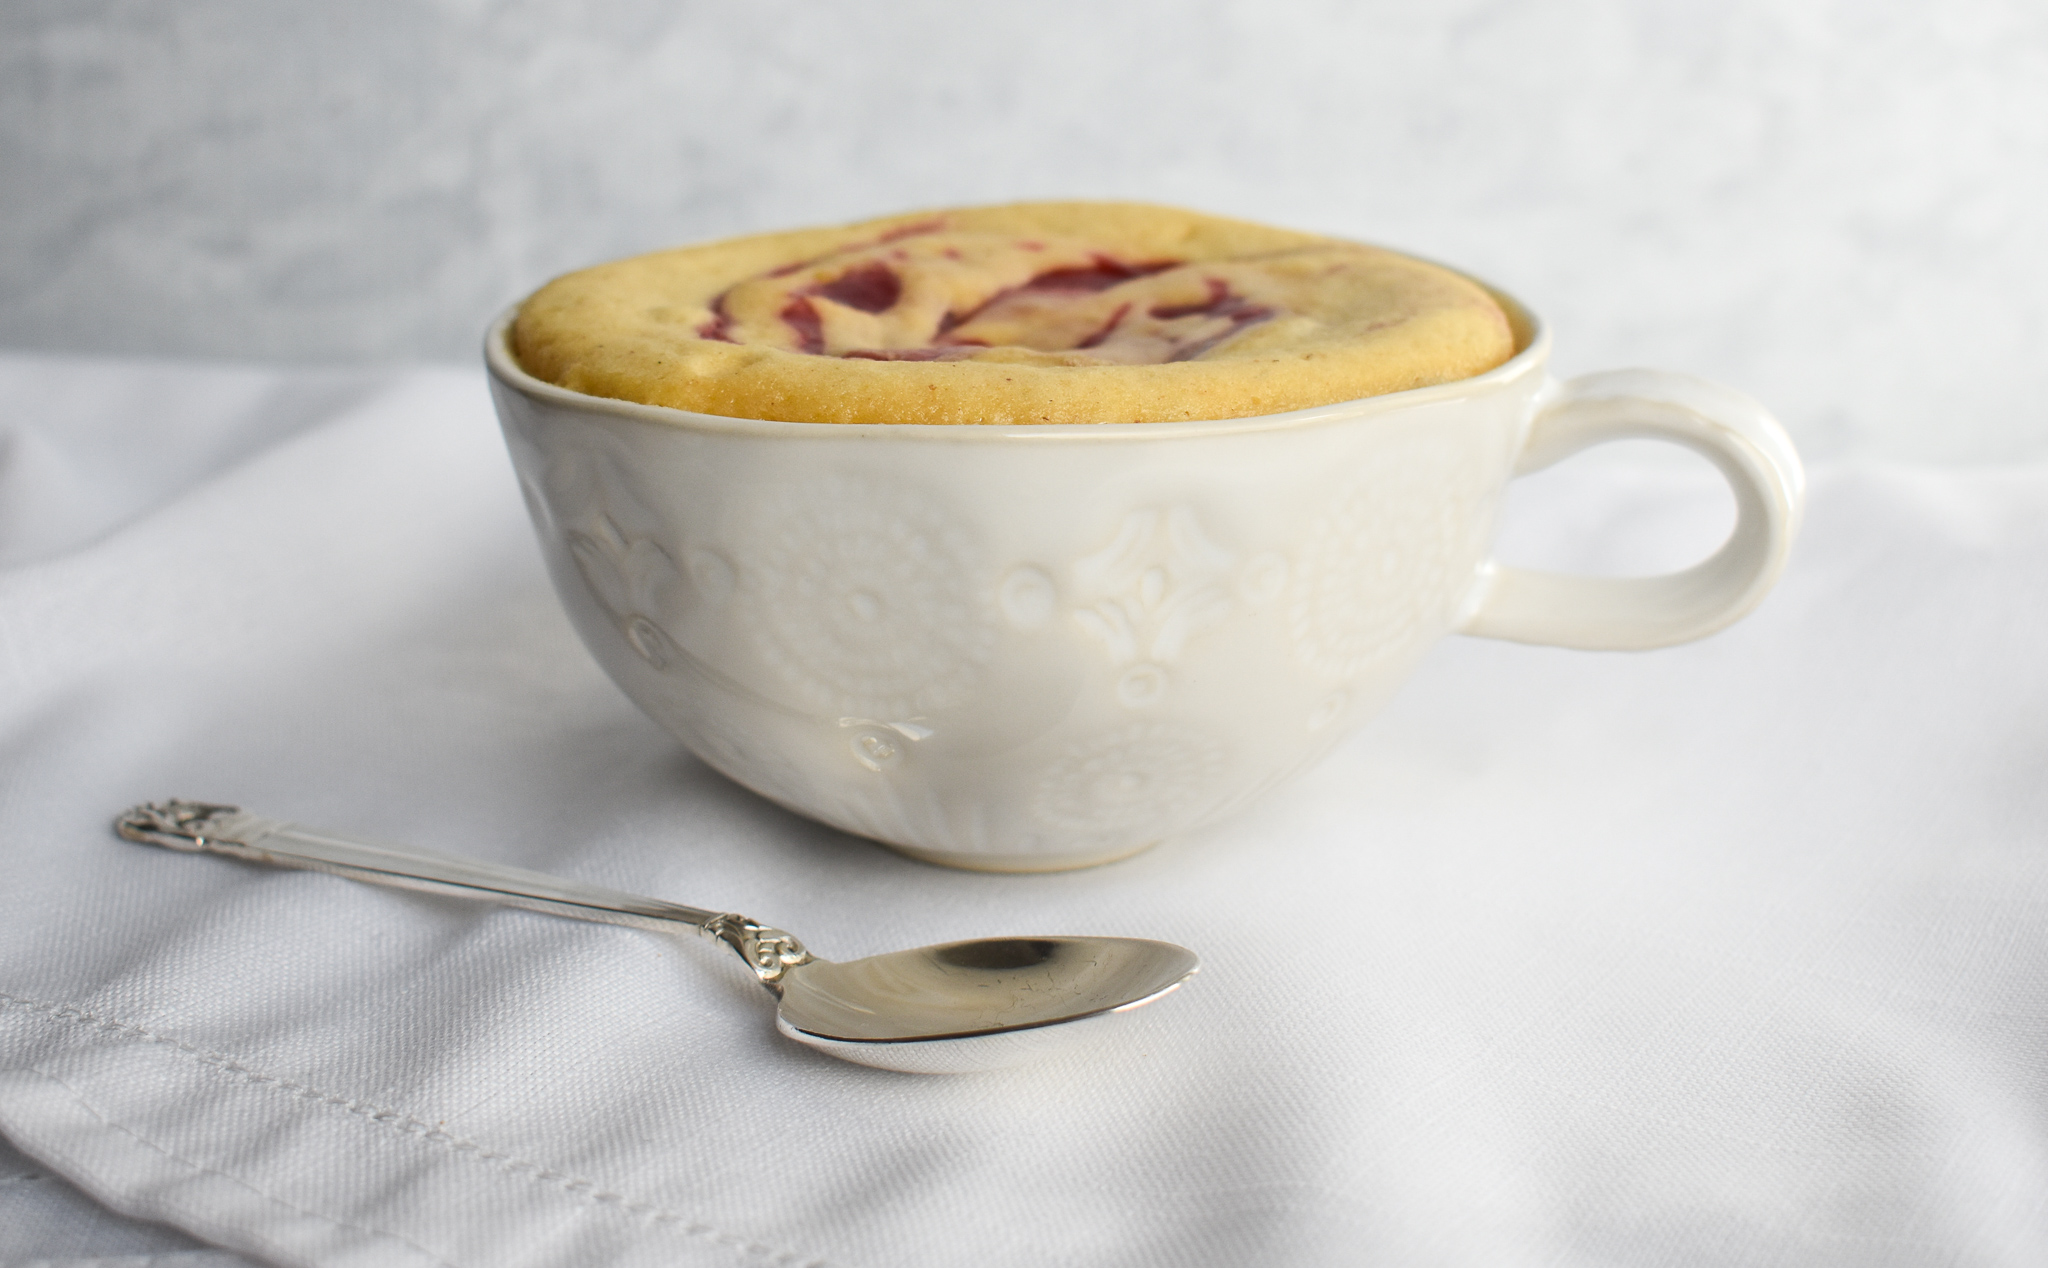 Low Fodmap 5 Minute Peanut Butter Jelly Mug Cake Gluten Free Dairy Free